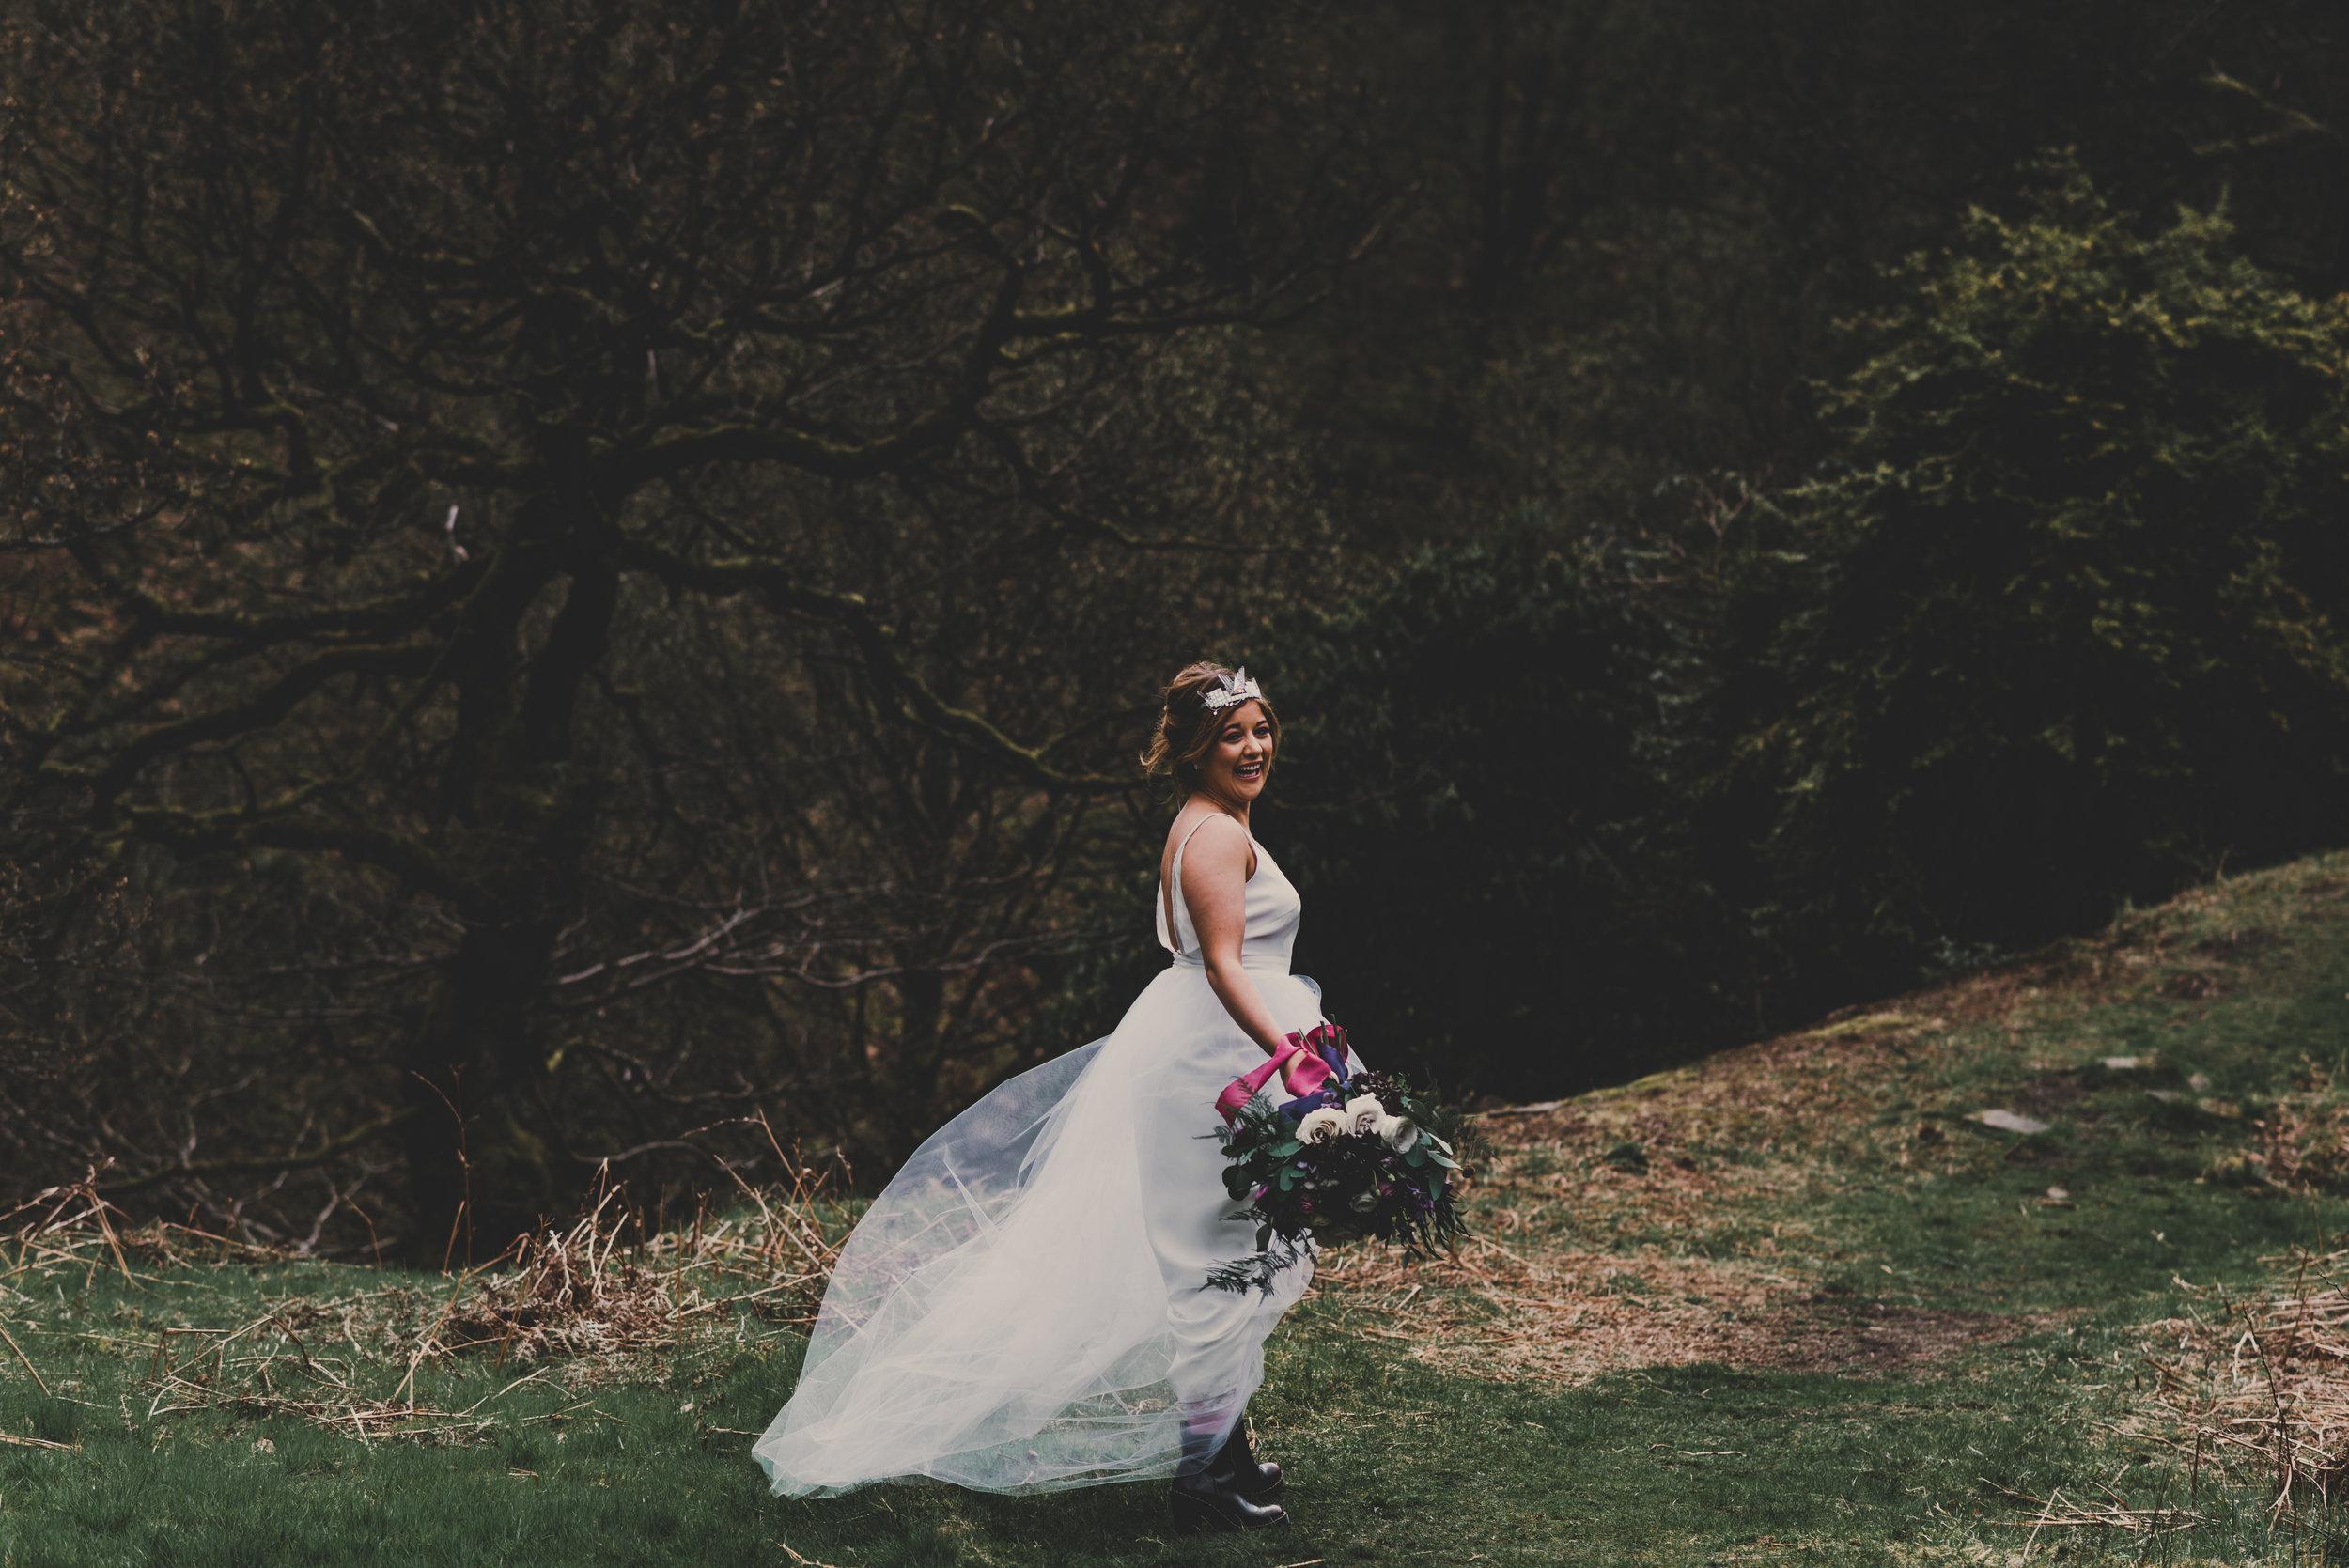 jade maguire photography wild wedding photography (9).jpg